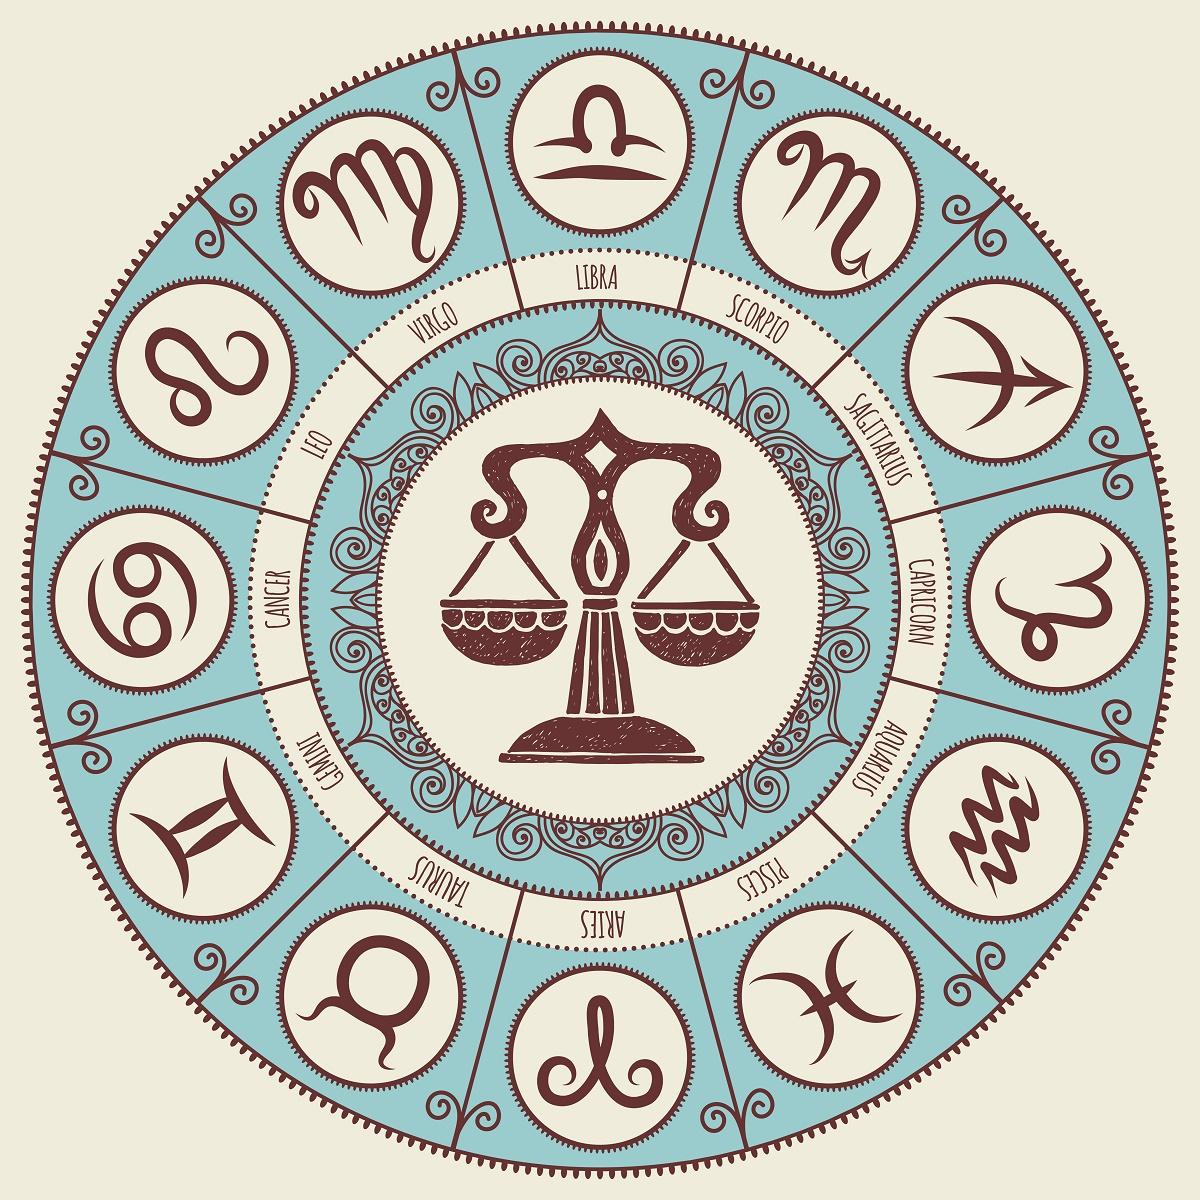 Horoscop săptămânal 13-19 noiembrie 2017 Balanță - Oana Hanganu